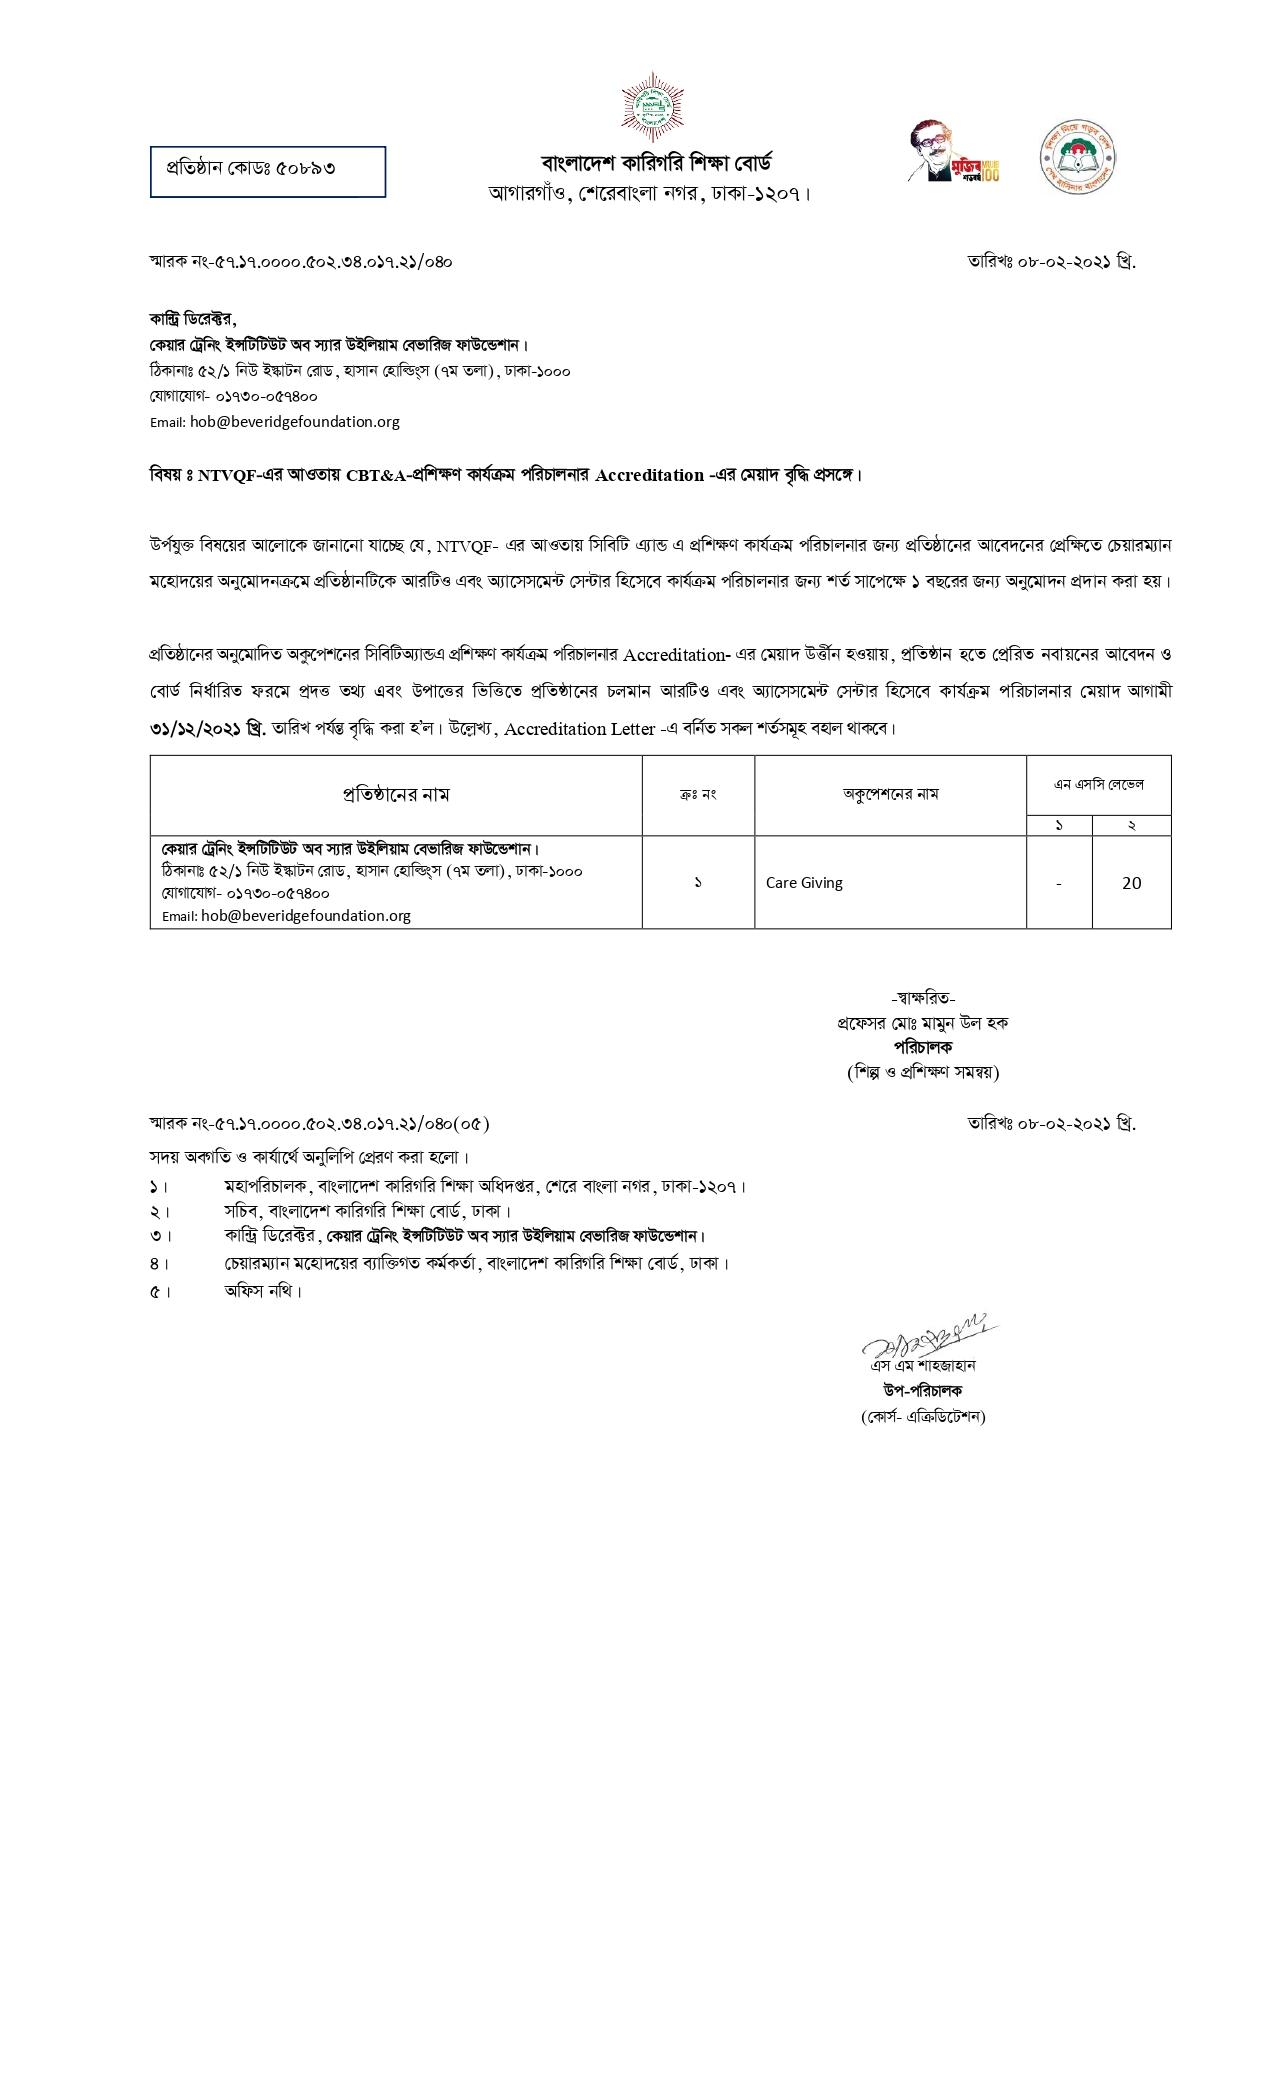 BTEB Certificate of SWBF